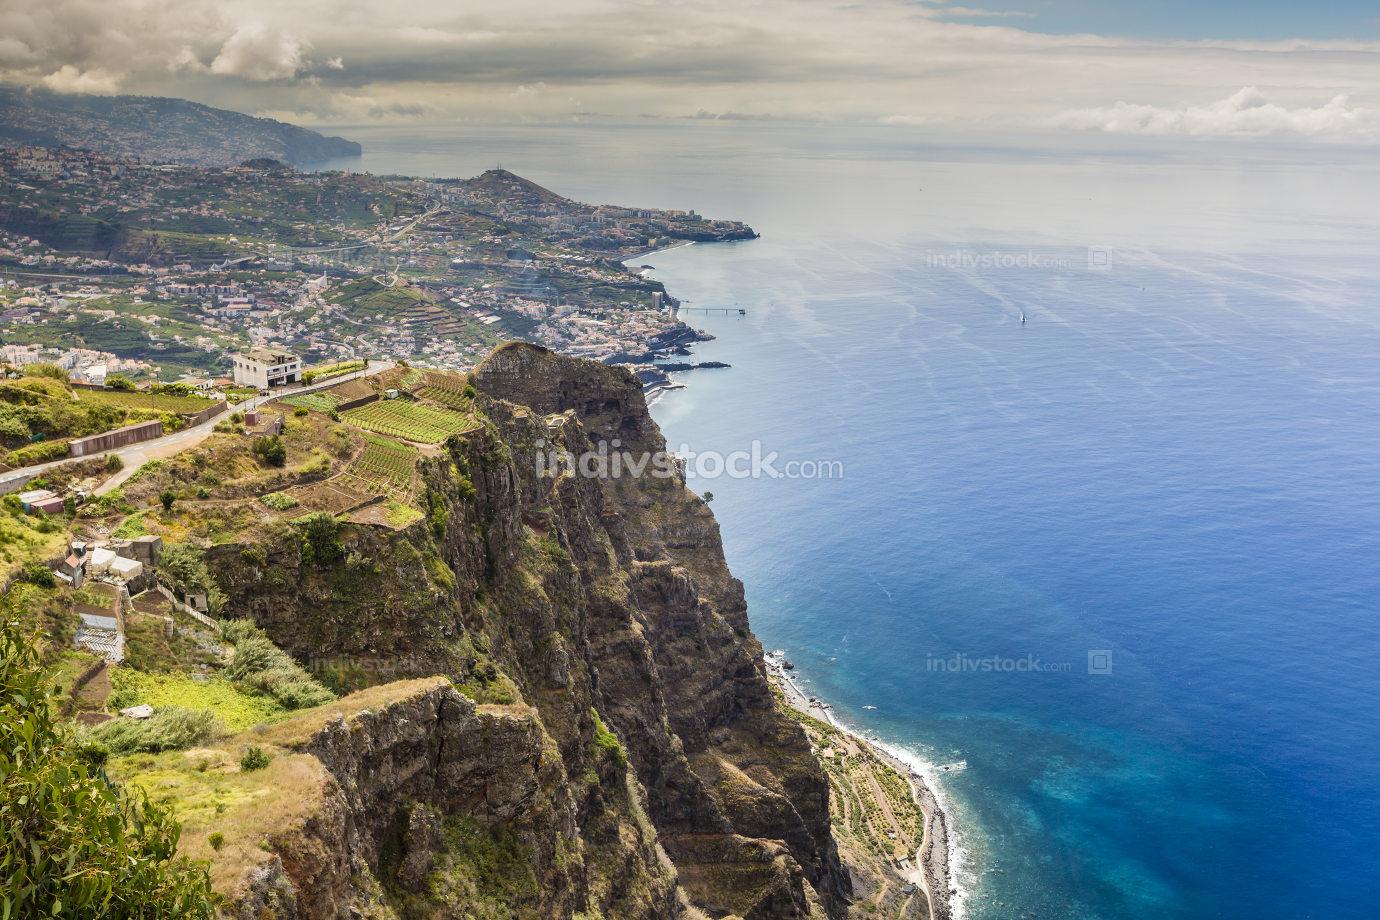 600 Meter high cliffs of Gabo Girao at Madeira Island, Portugal